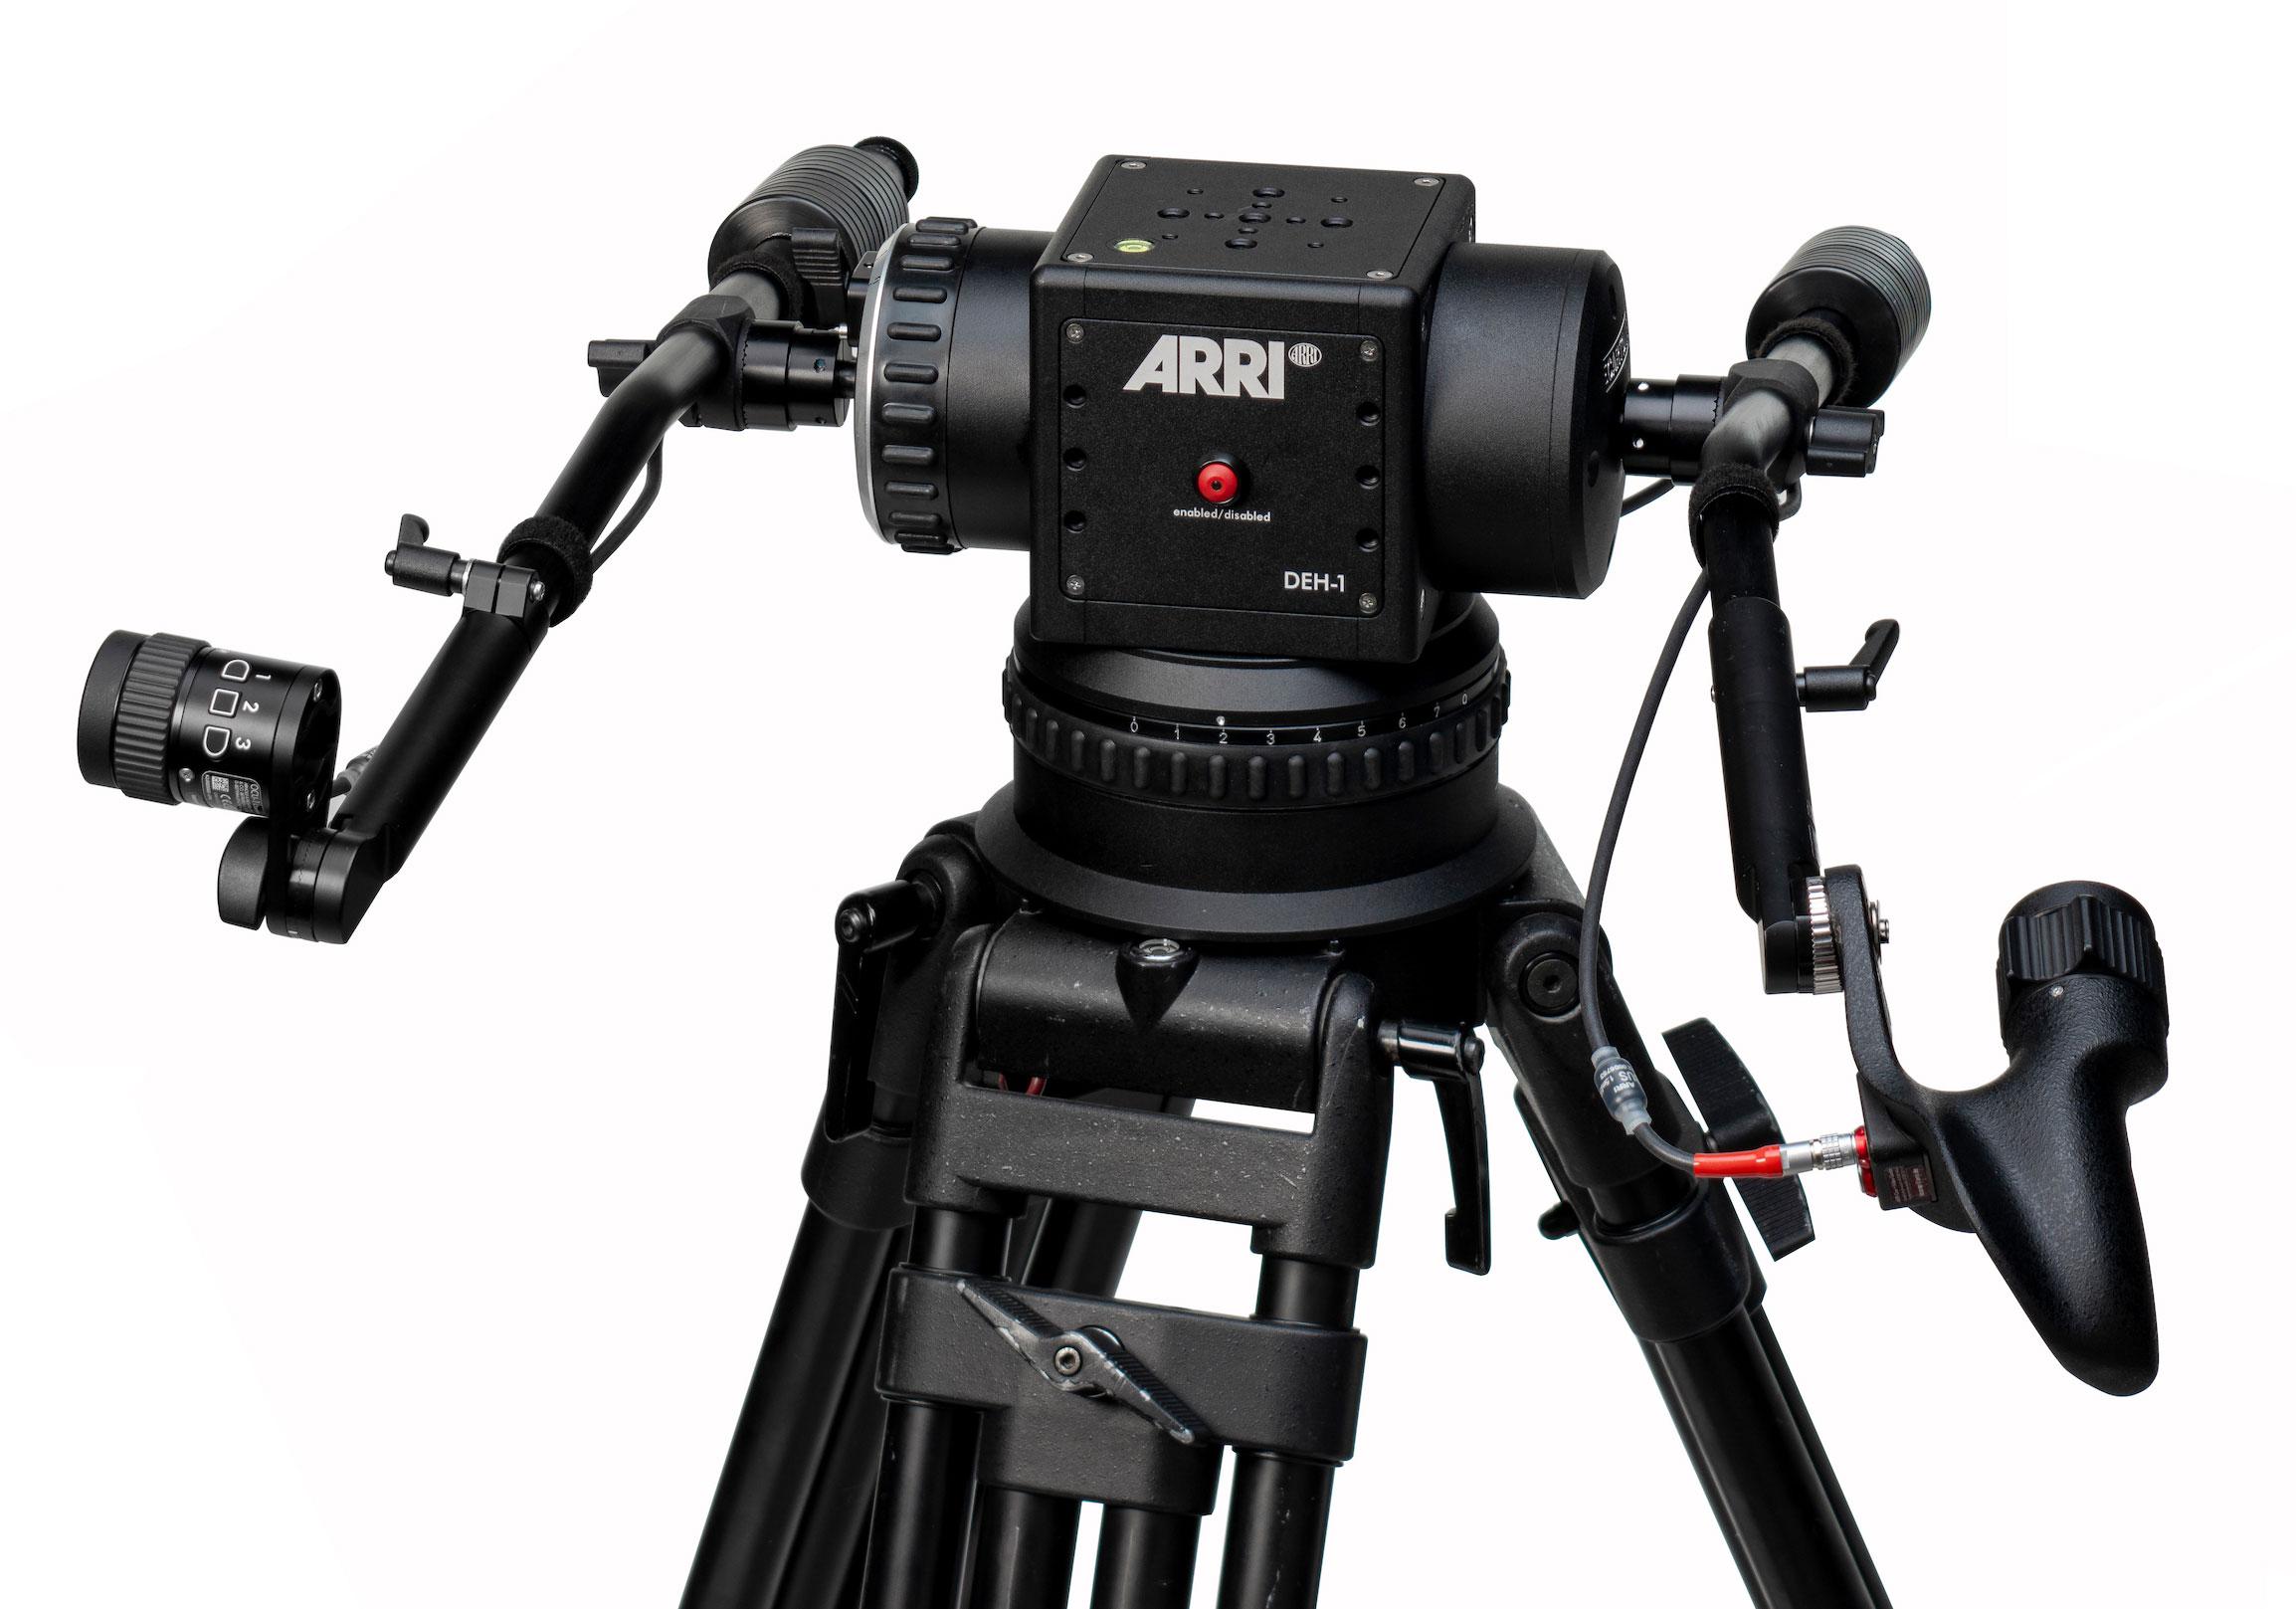 ARRI: DEH-1 Digital Encoder Head Expands Remote SRH-3 Stabilization System